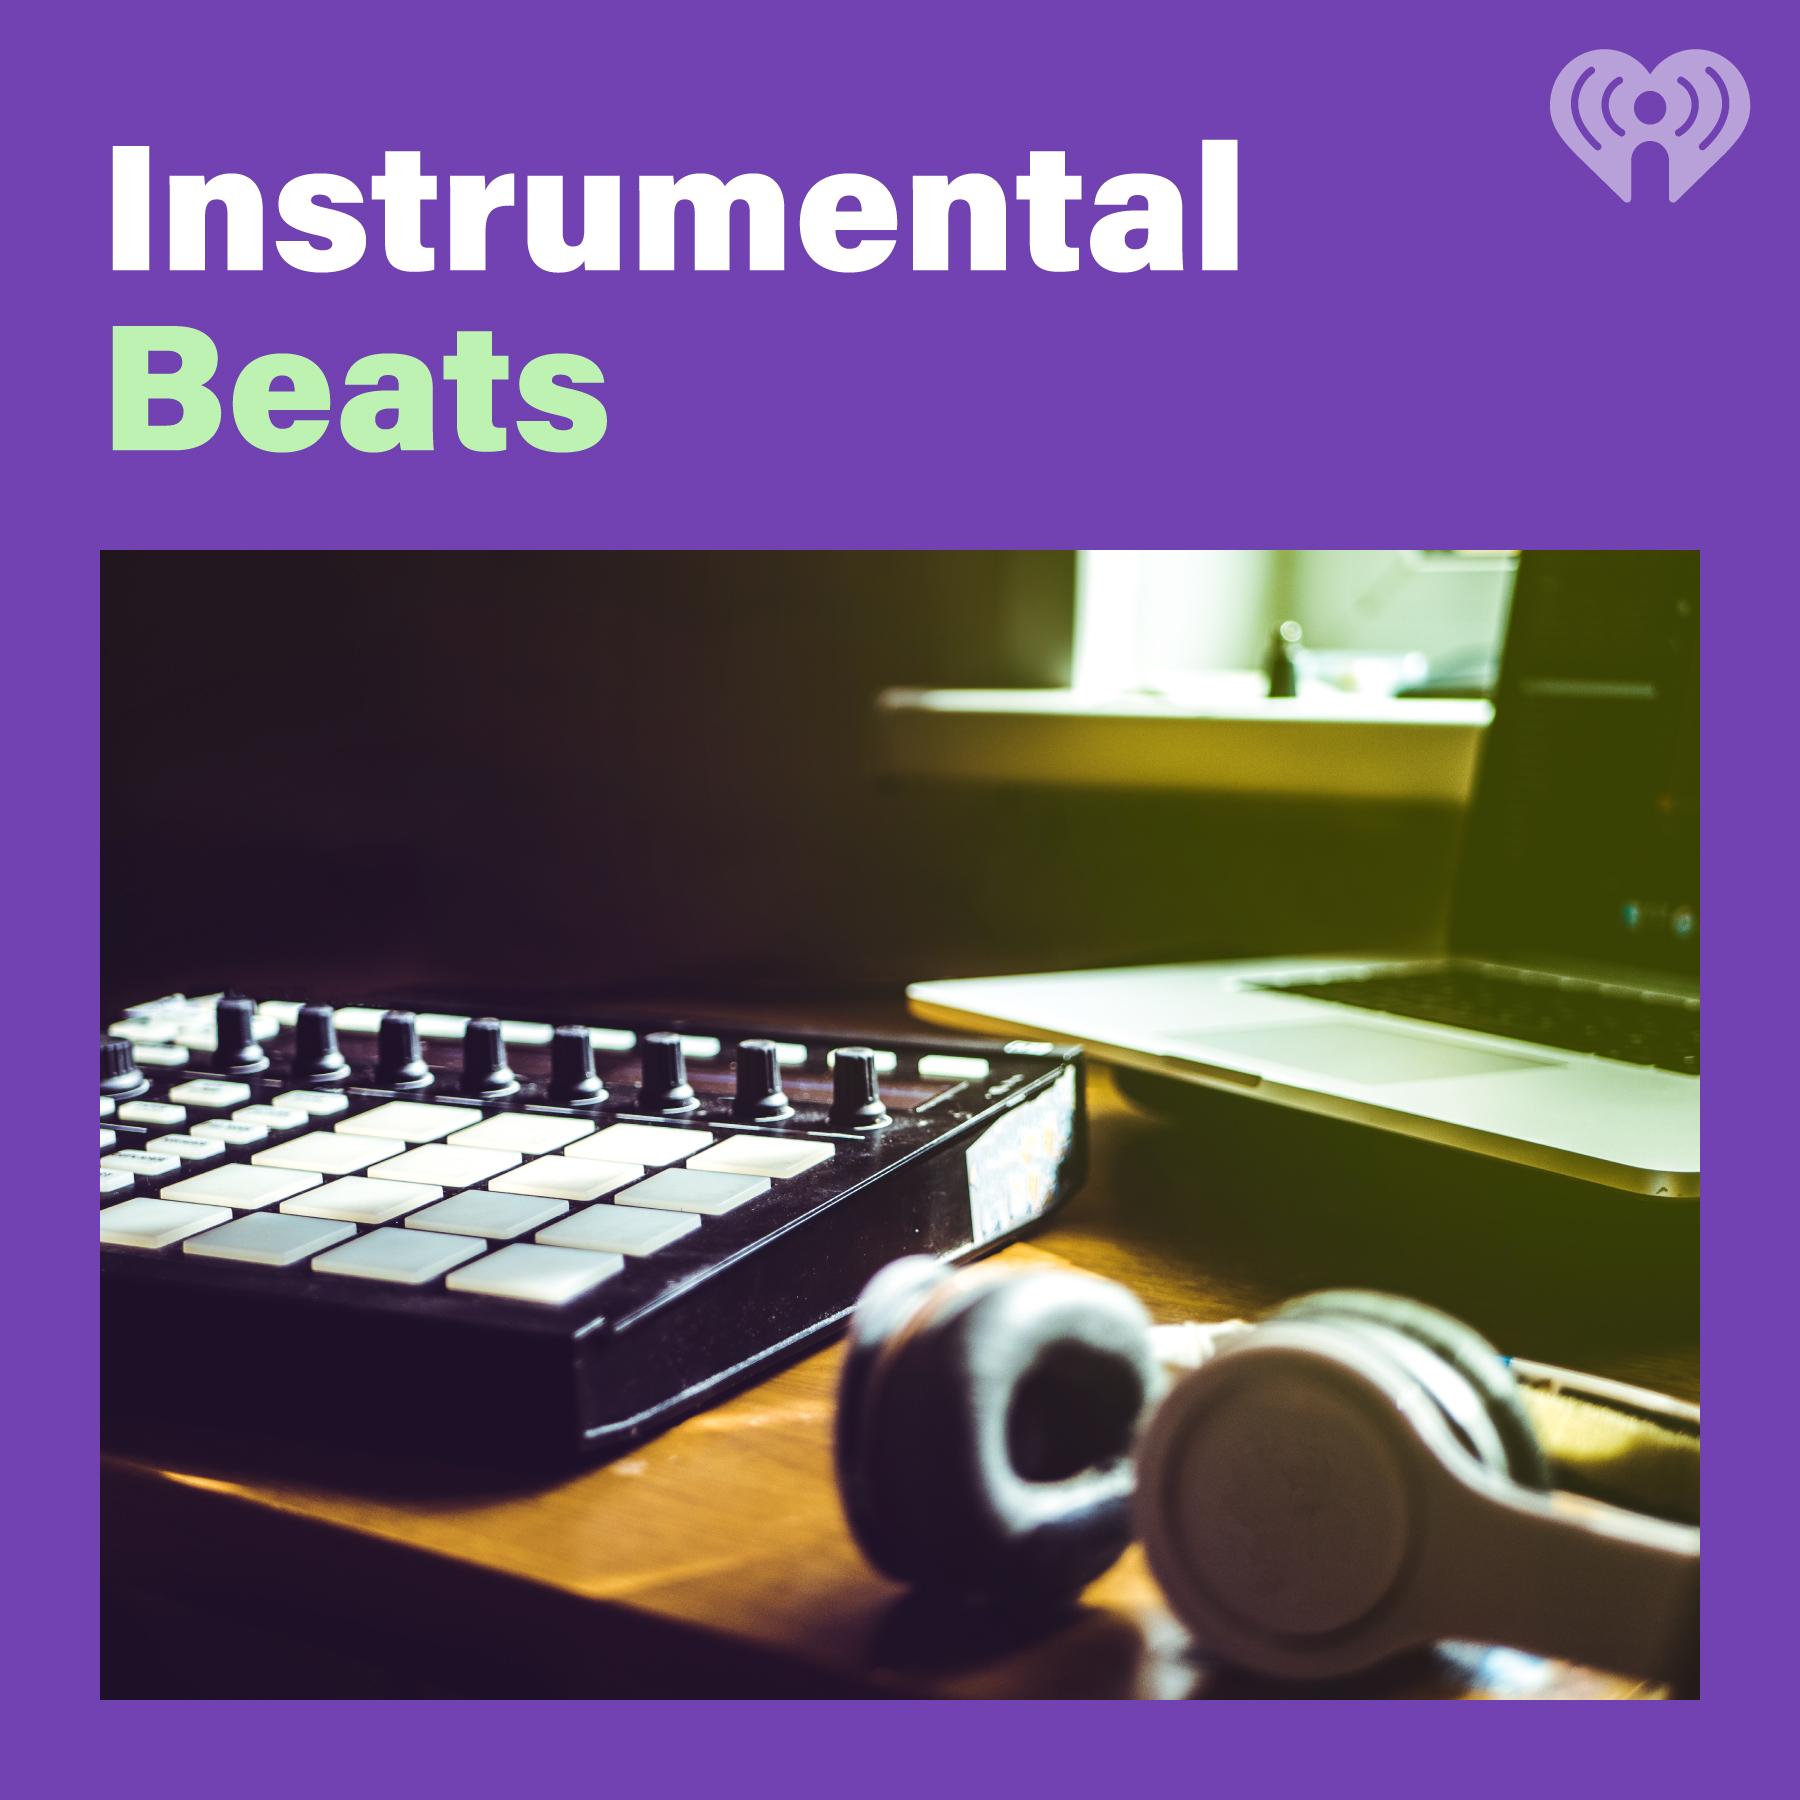 Instrumental Beats | iHeartRadio